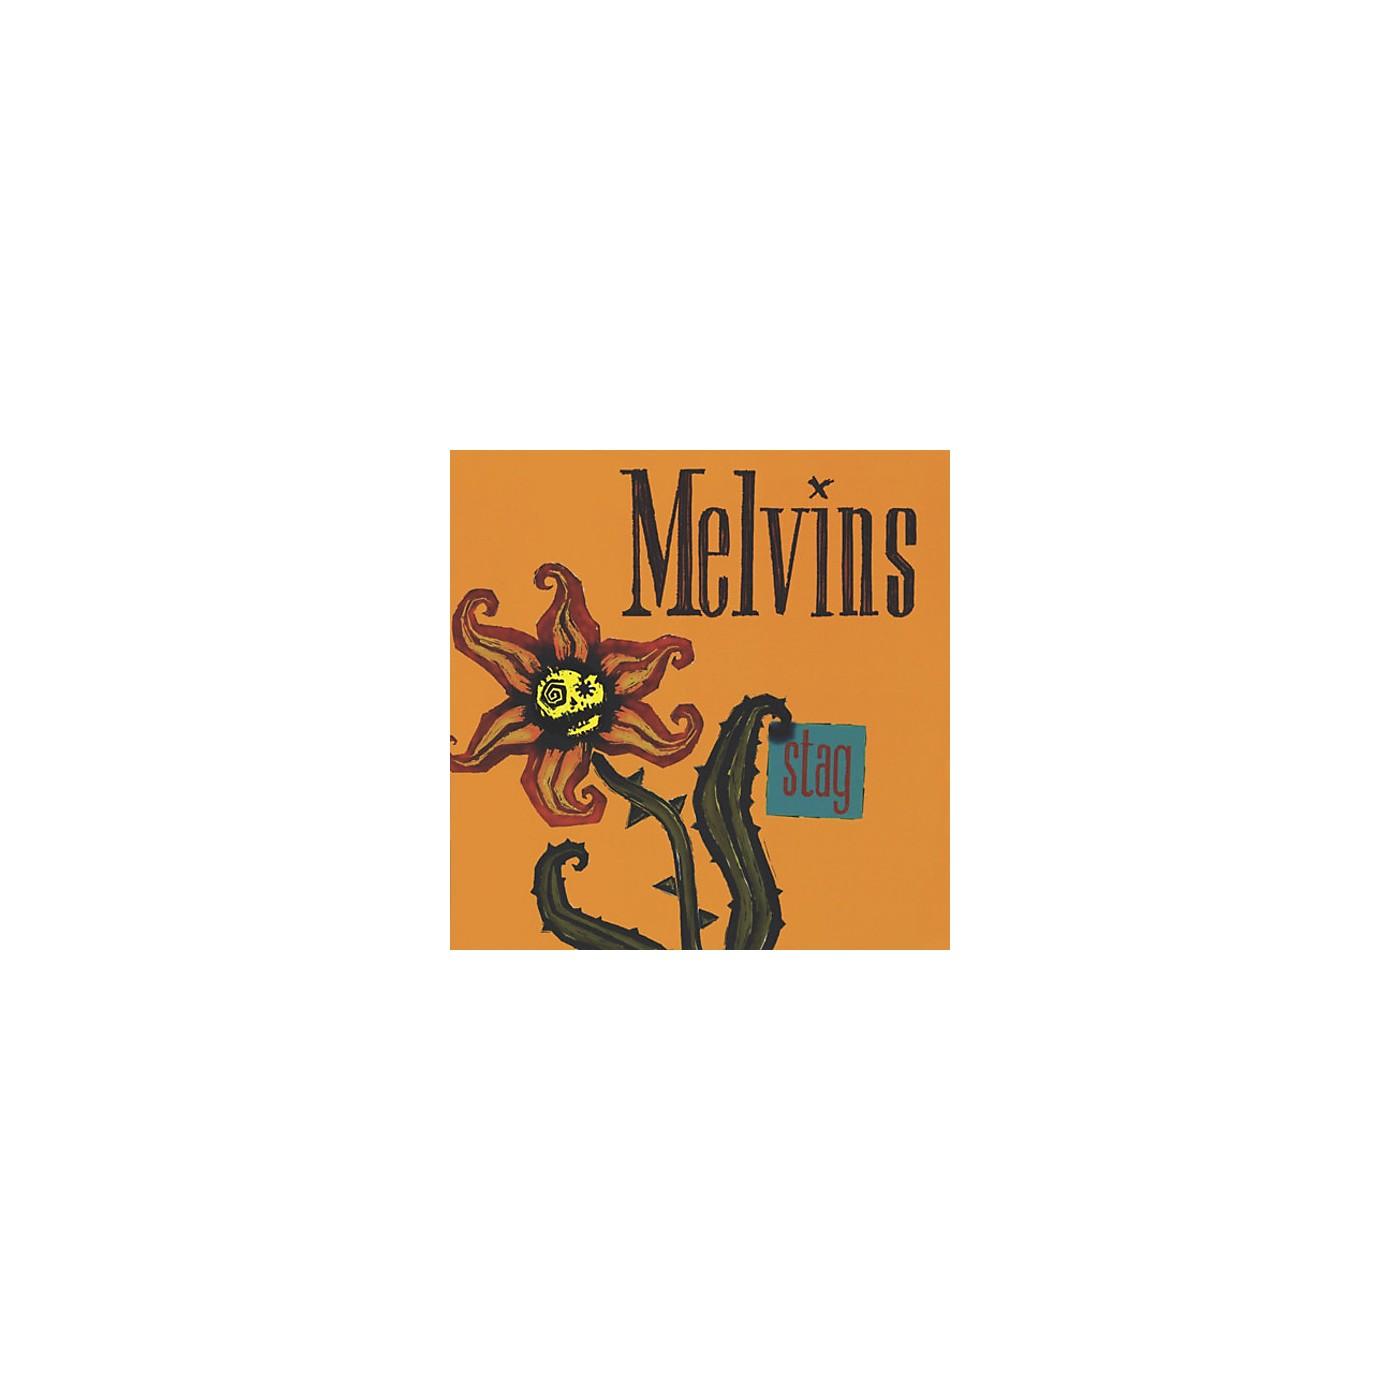 Alliance Melvins - Stag thumbnail